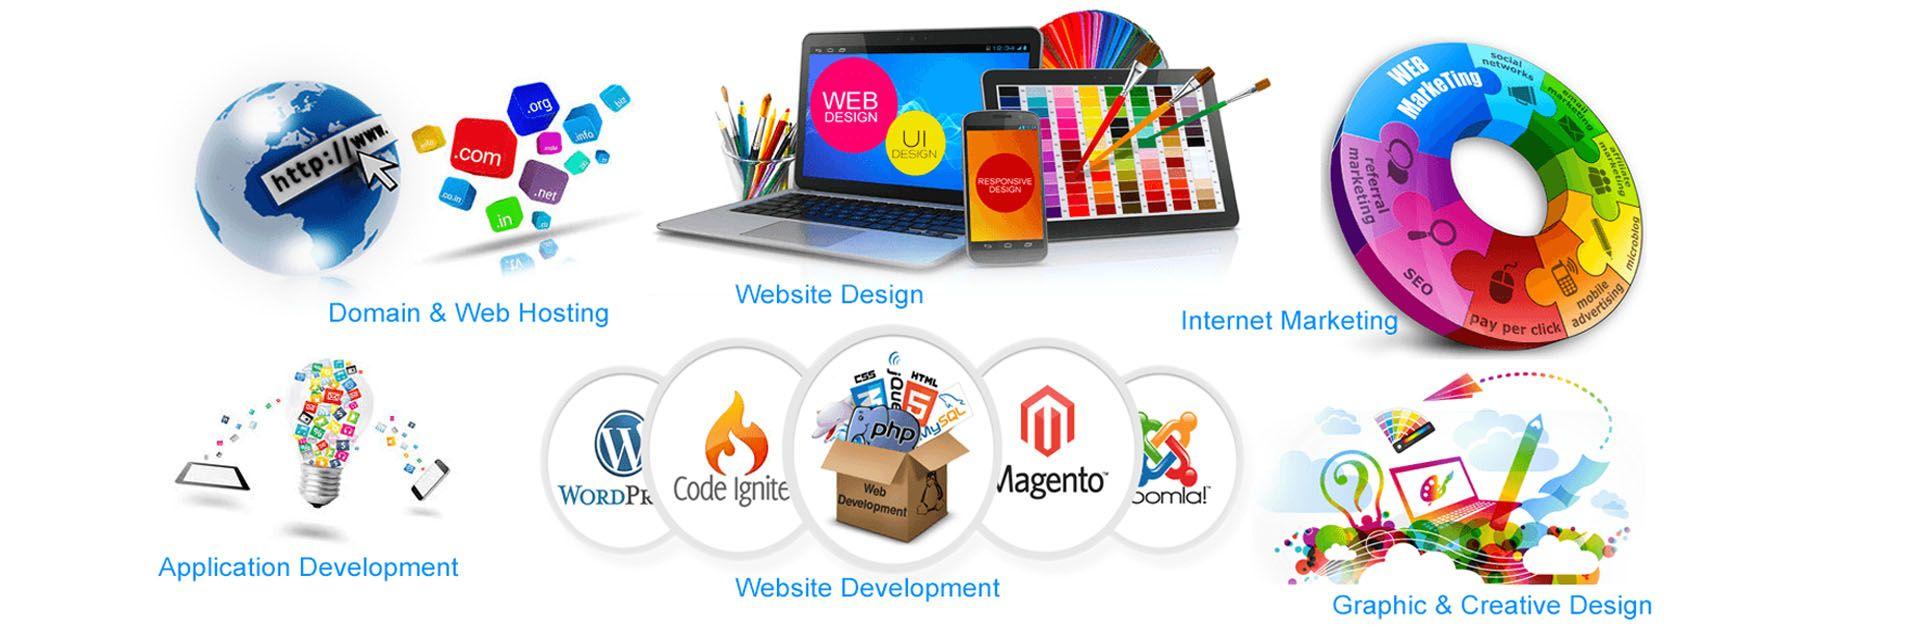 Los Angeles Web Design Development Web Design Services Web Design Company Web Development Company